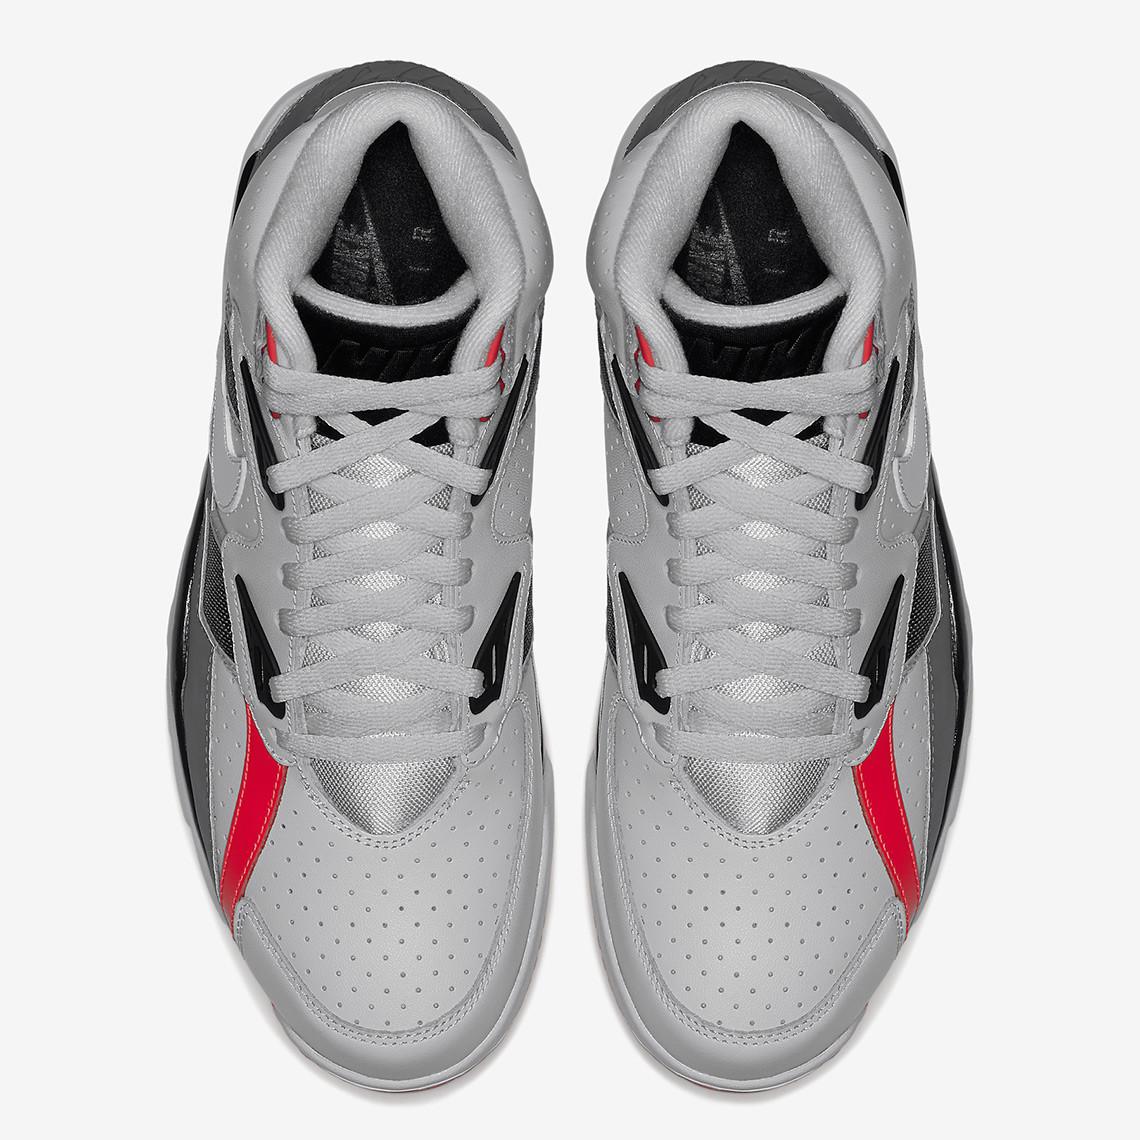 Nike Air Trainer SC High « Vast Grey »